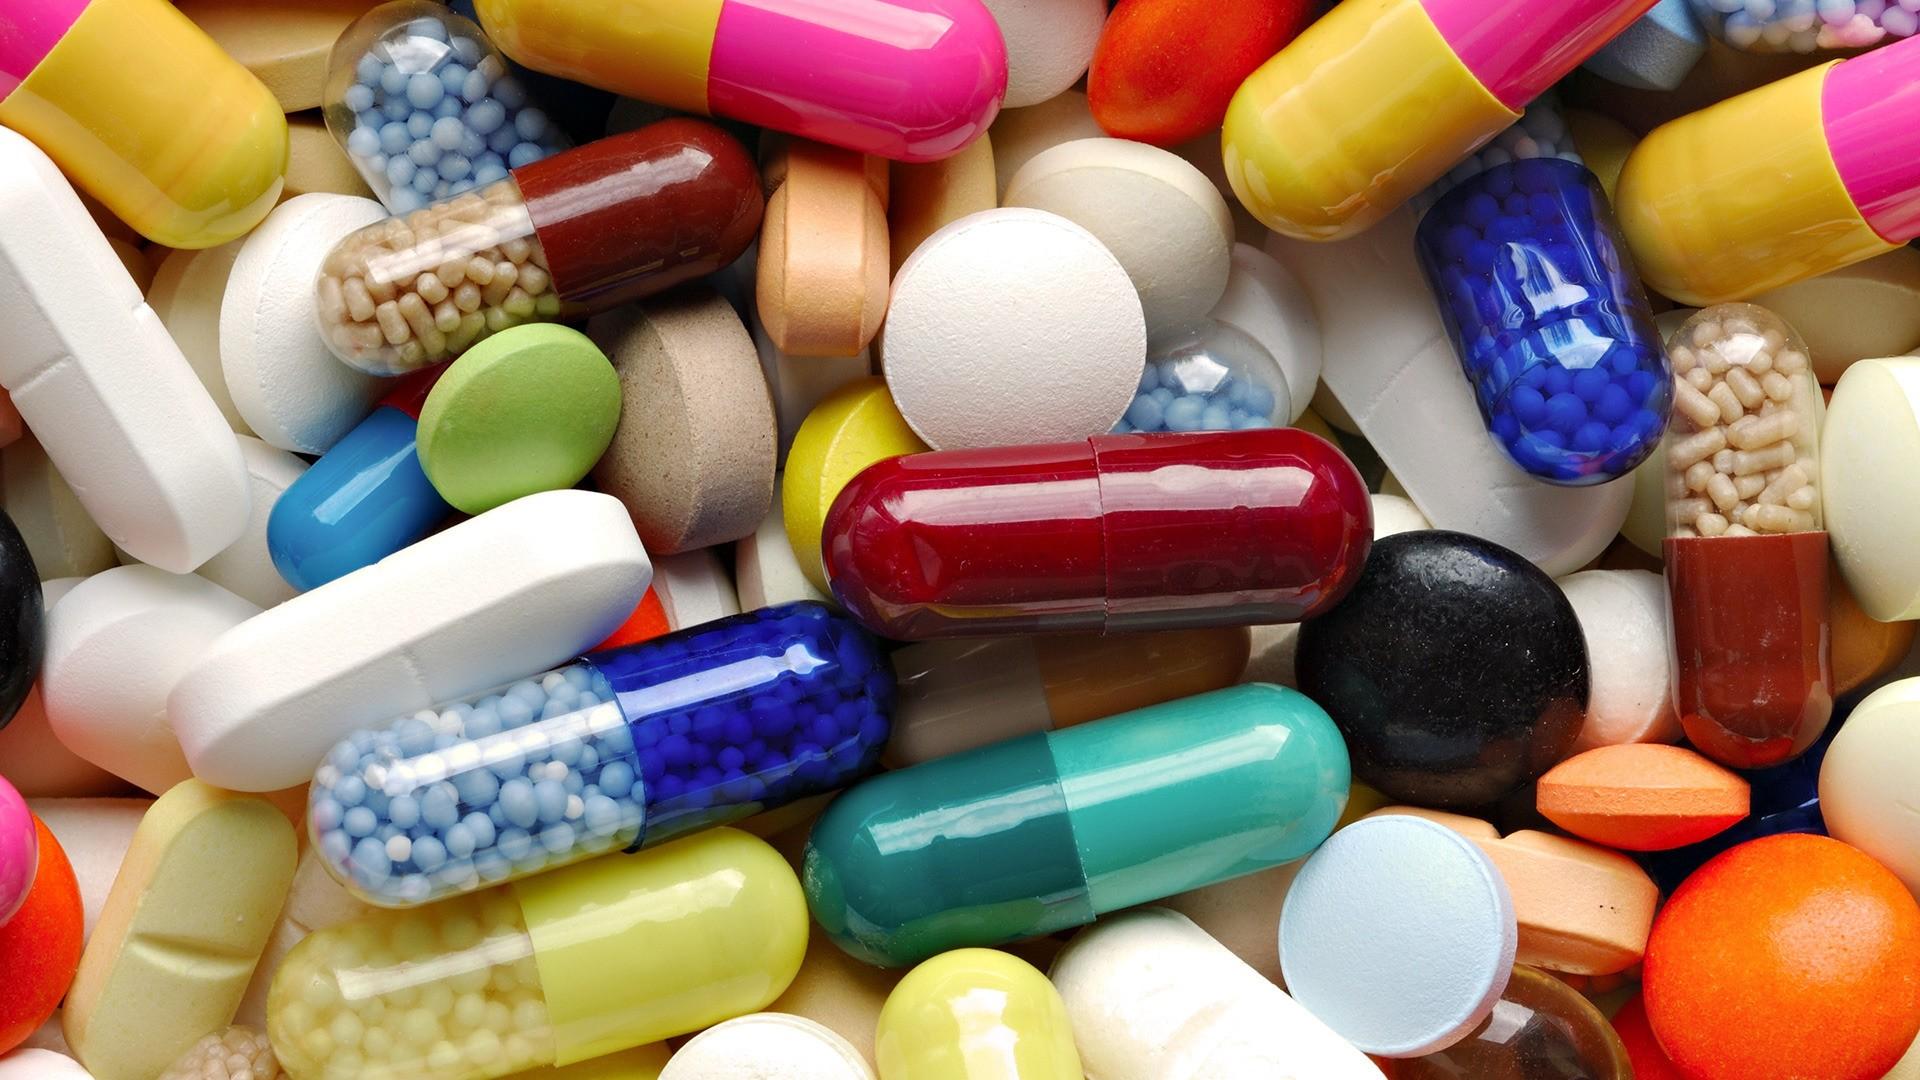 Wallpaper Pills Medicine Pharmacy Color Medical HD Wallpapers Download Free Images Wallpaper [1000image.com]